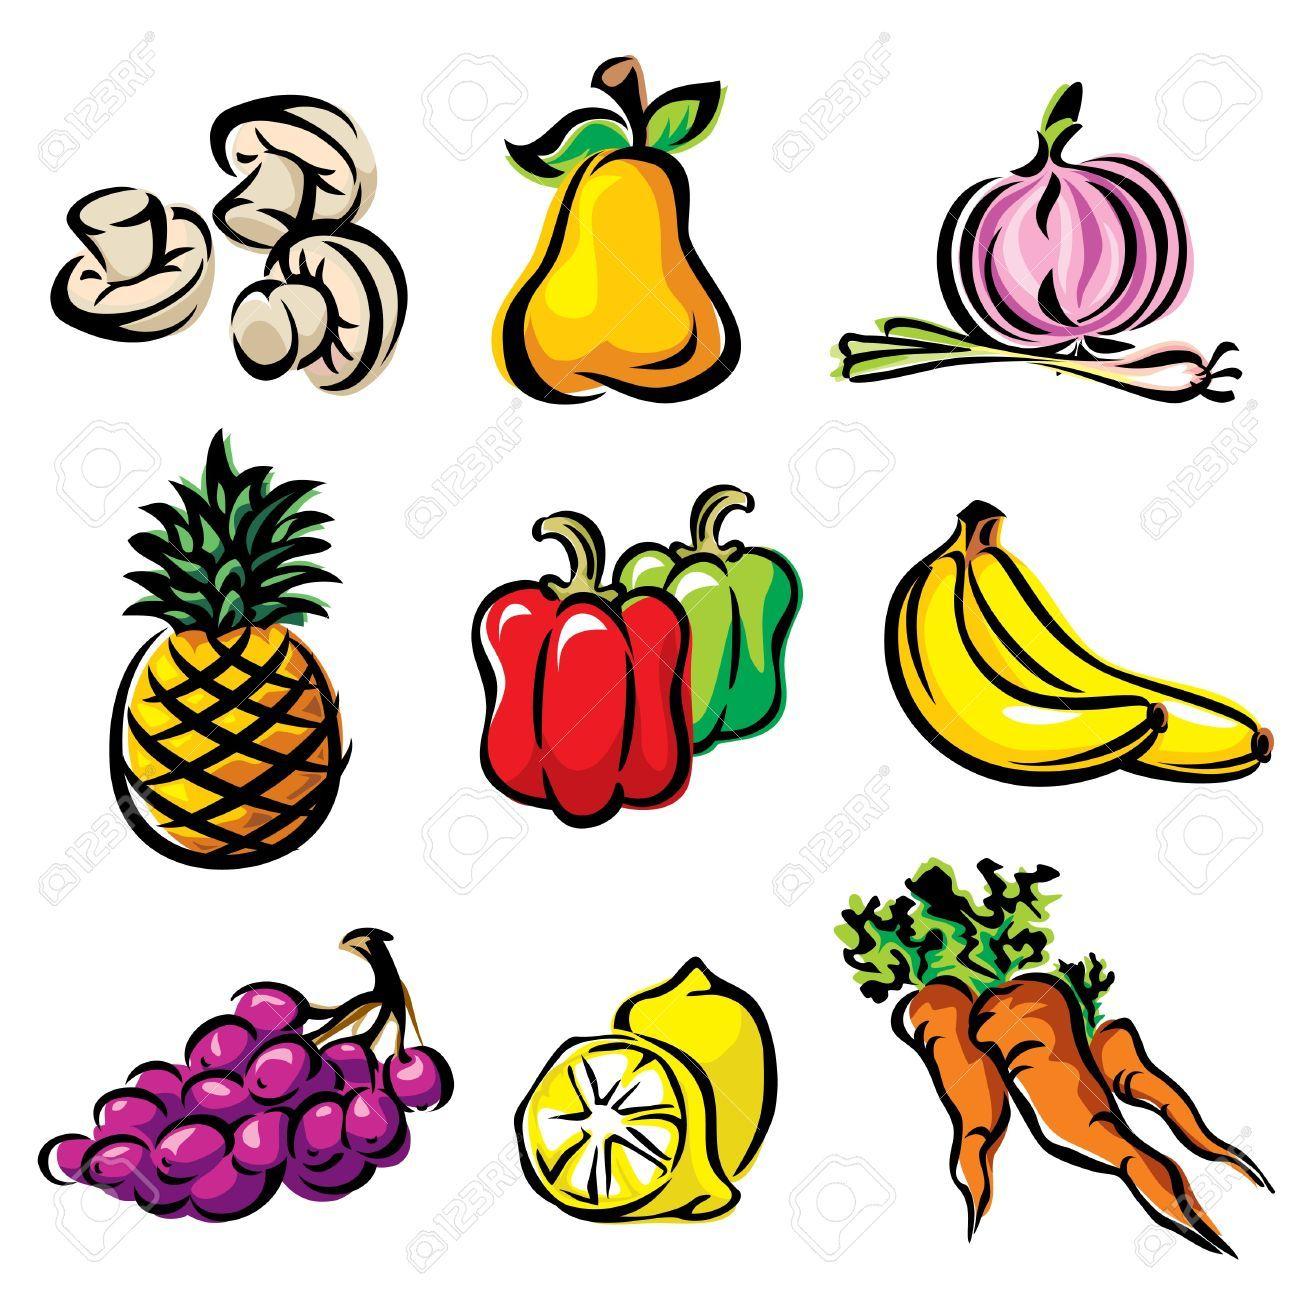 Imagenes infantiles de frutas animadas - Imagui | Mercados ...